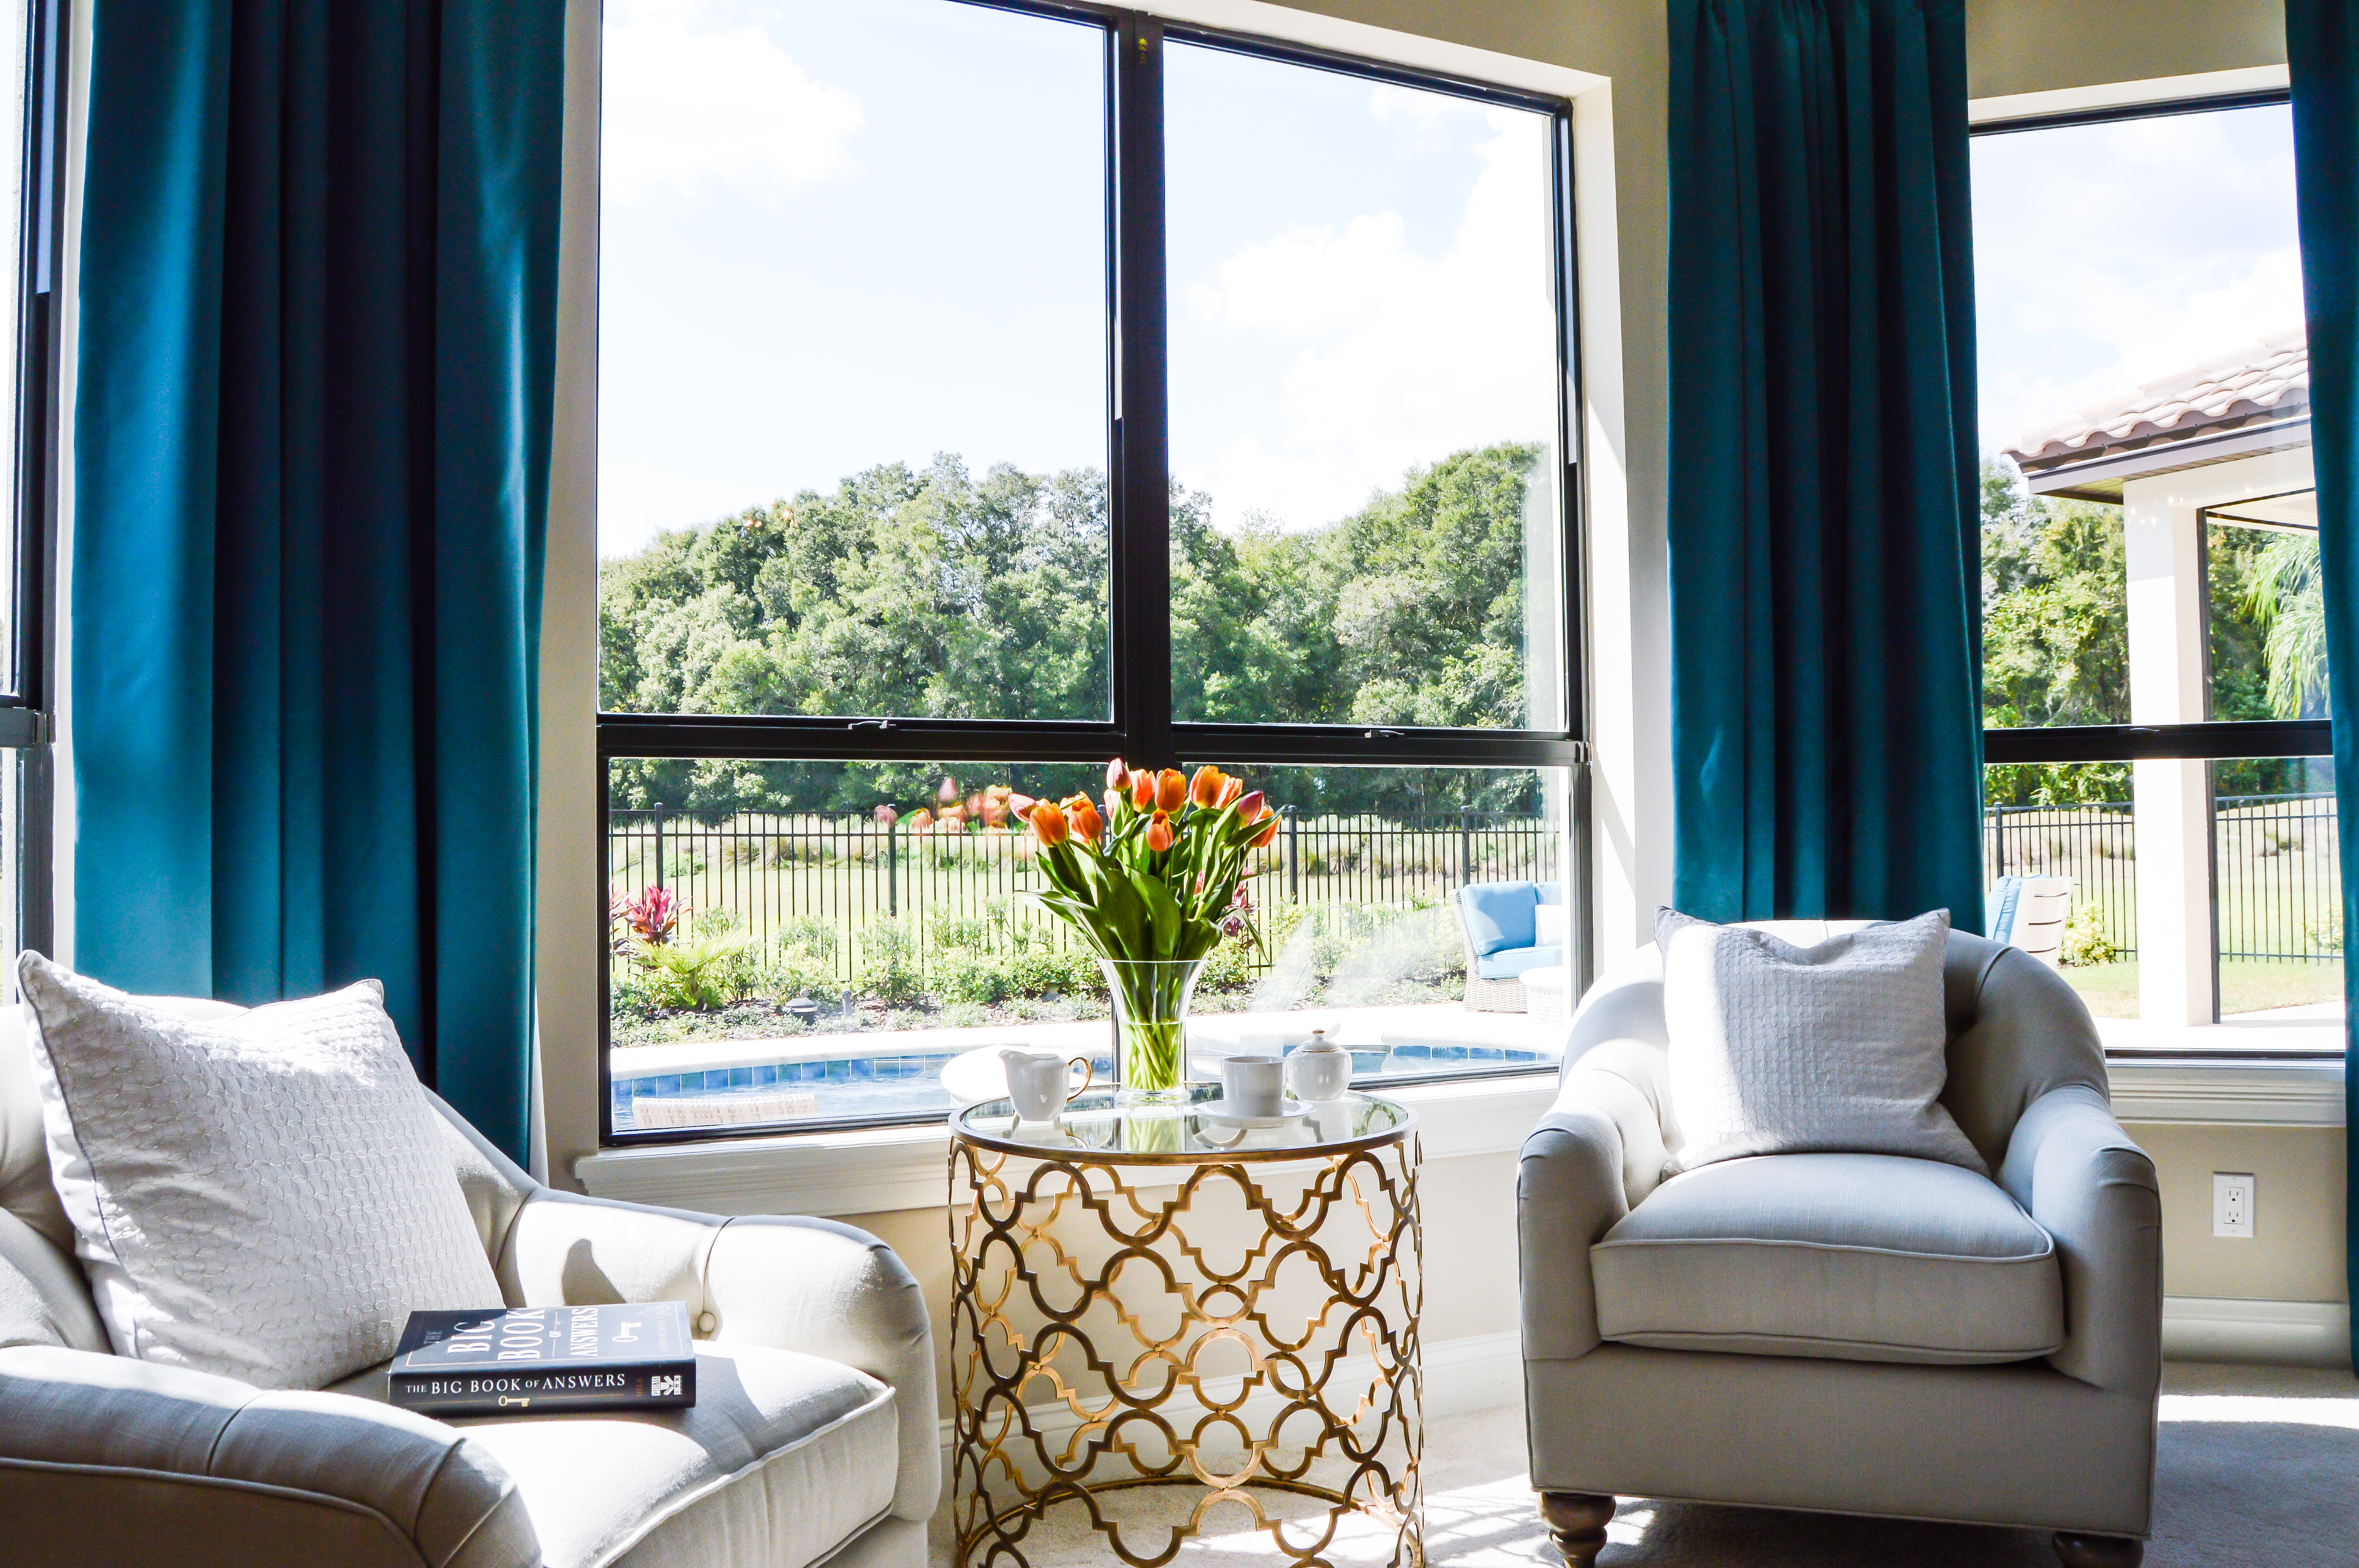 RedTail - New custom built luxury homes in Florida